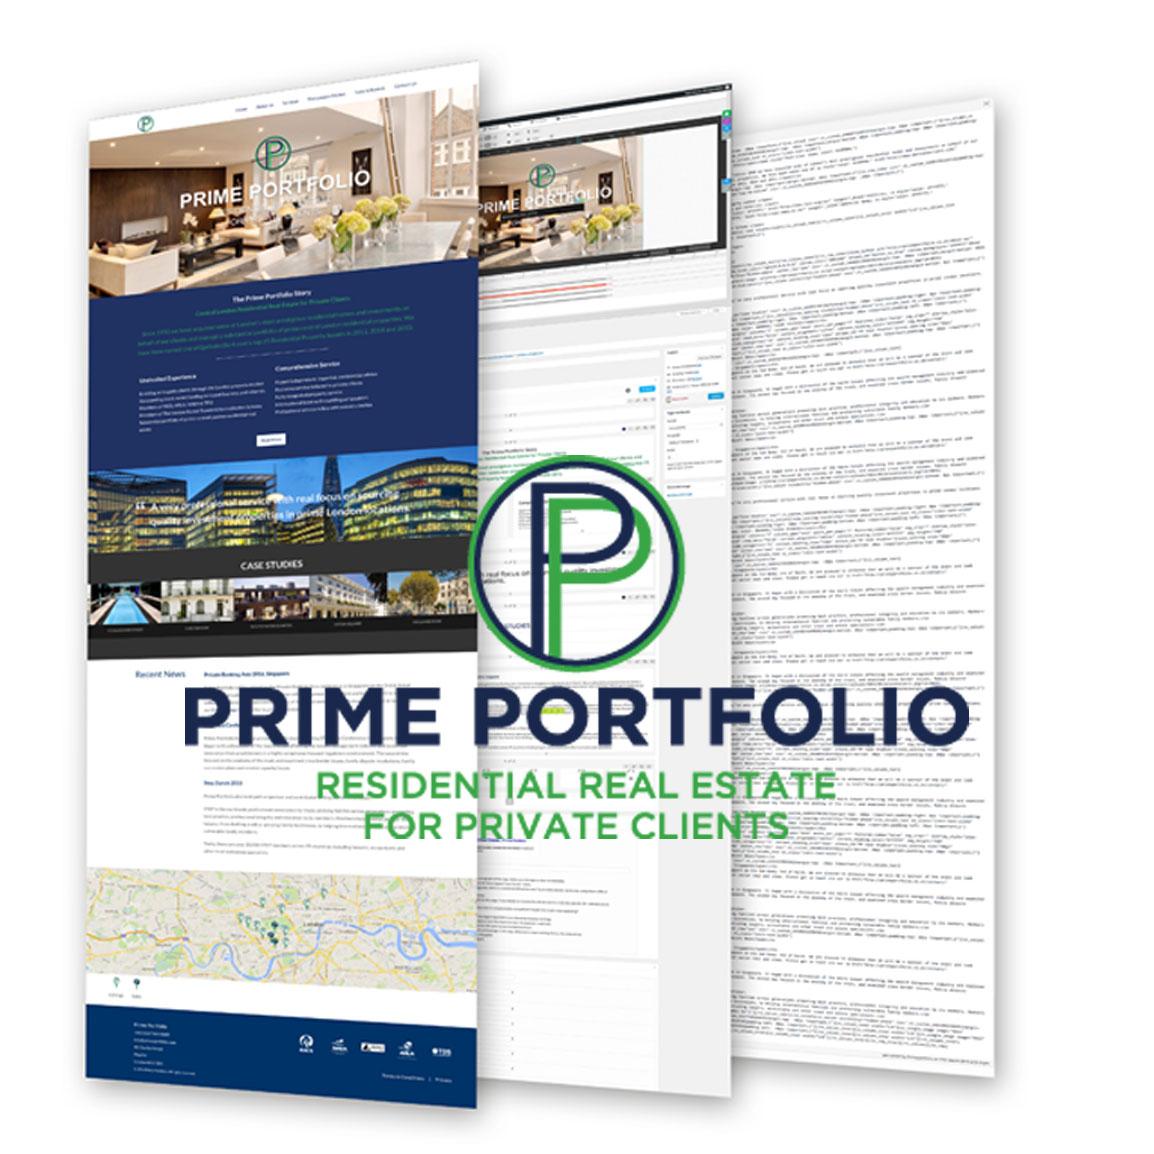 prime_portfolio_screen_1